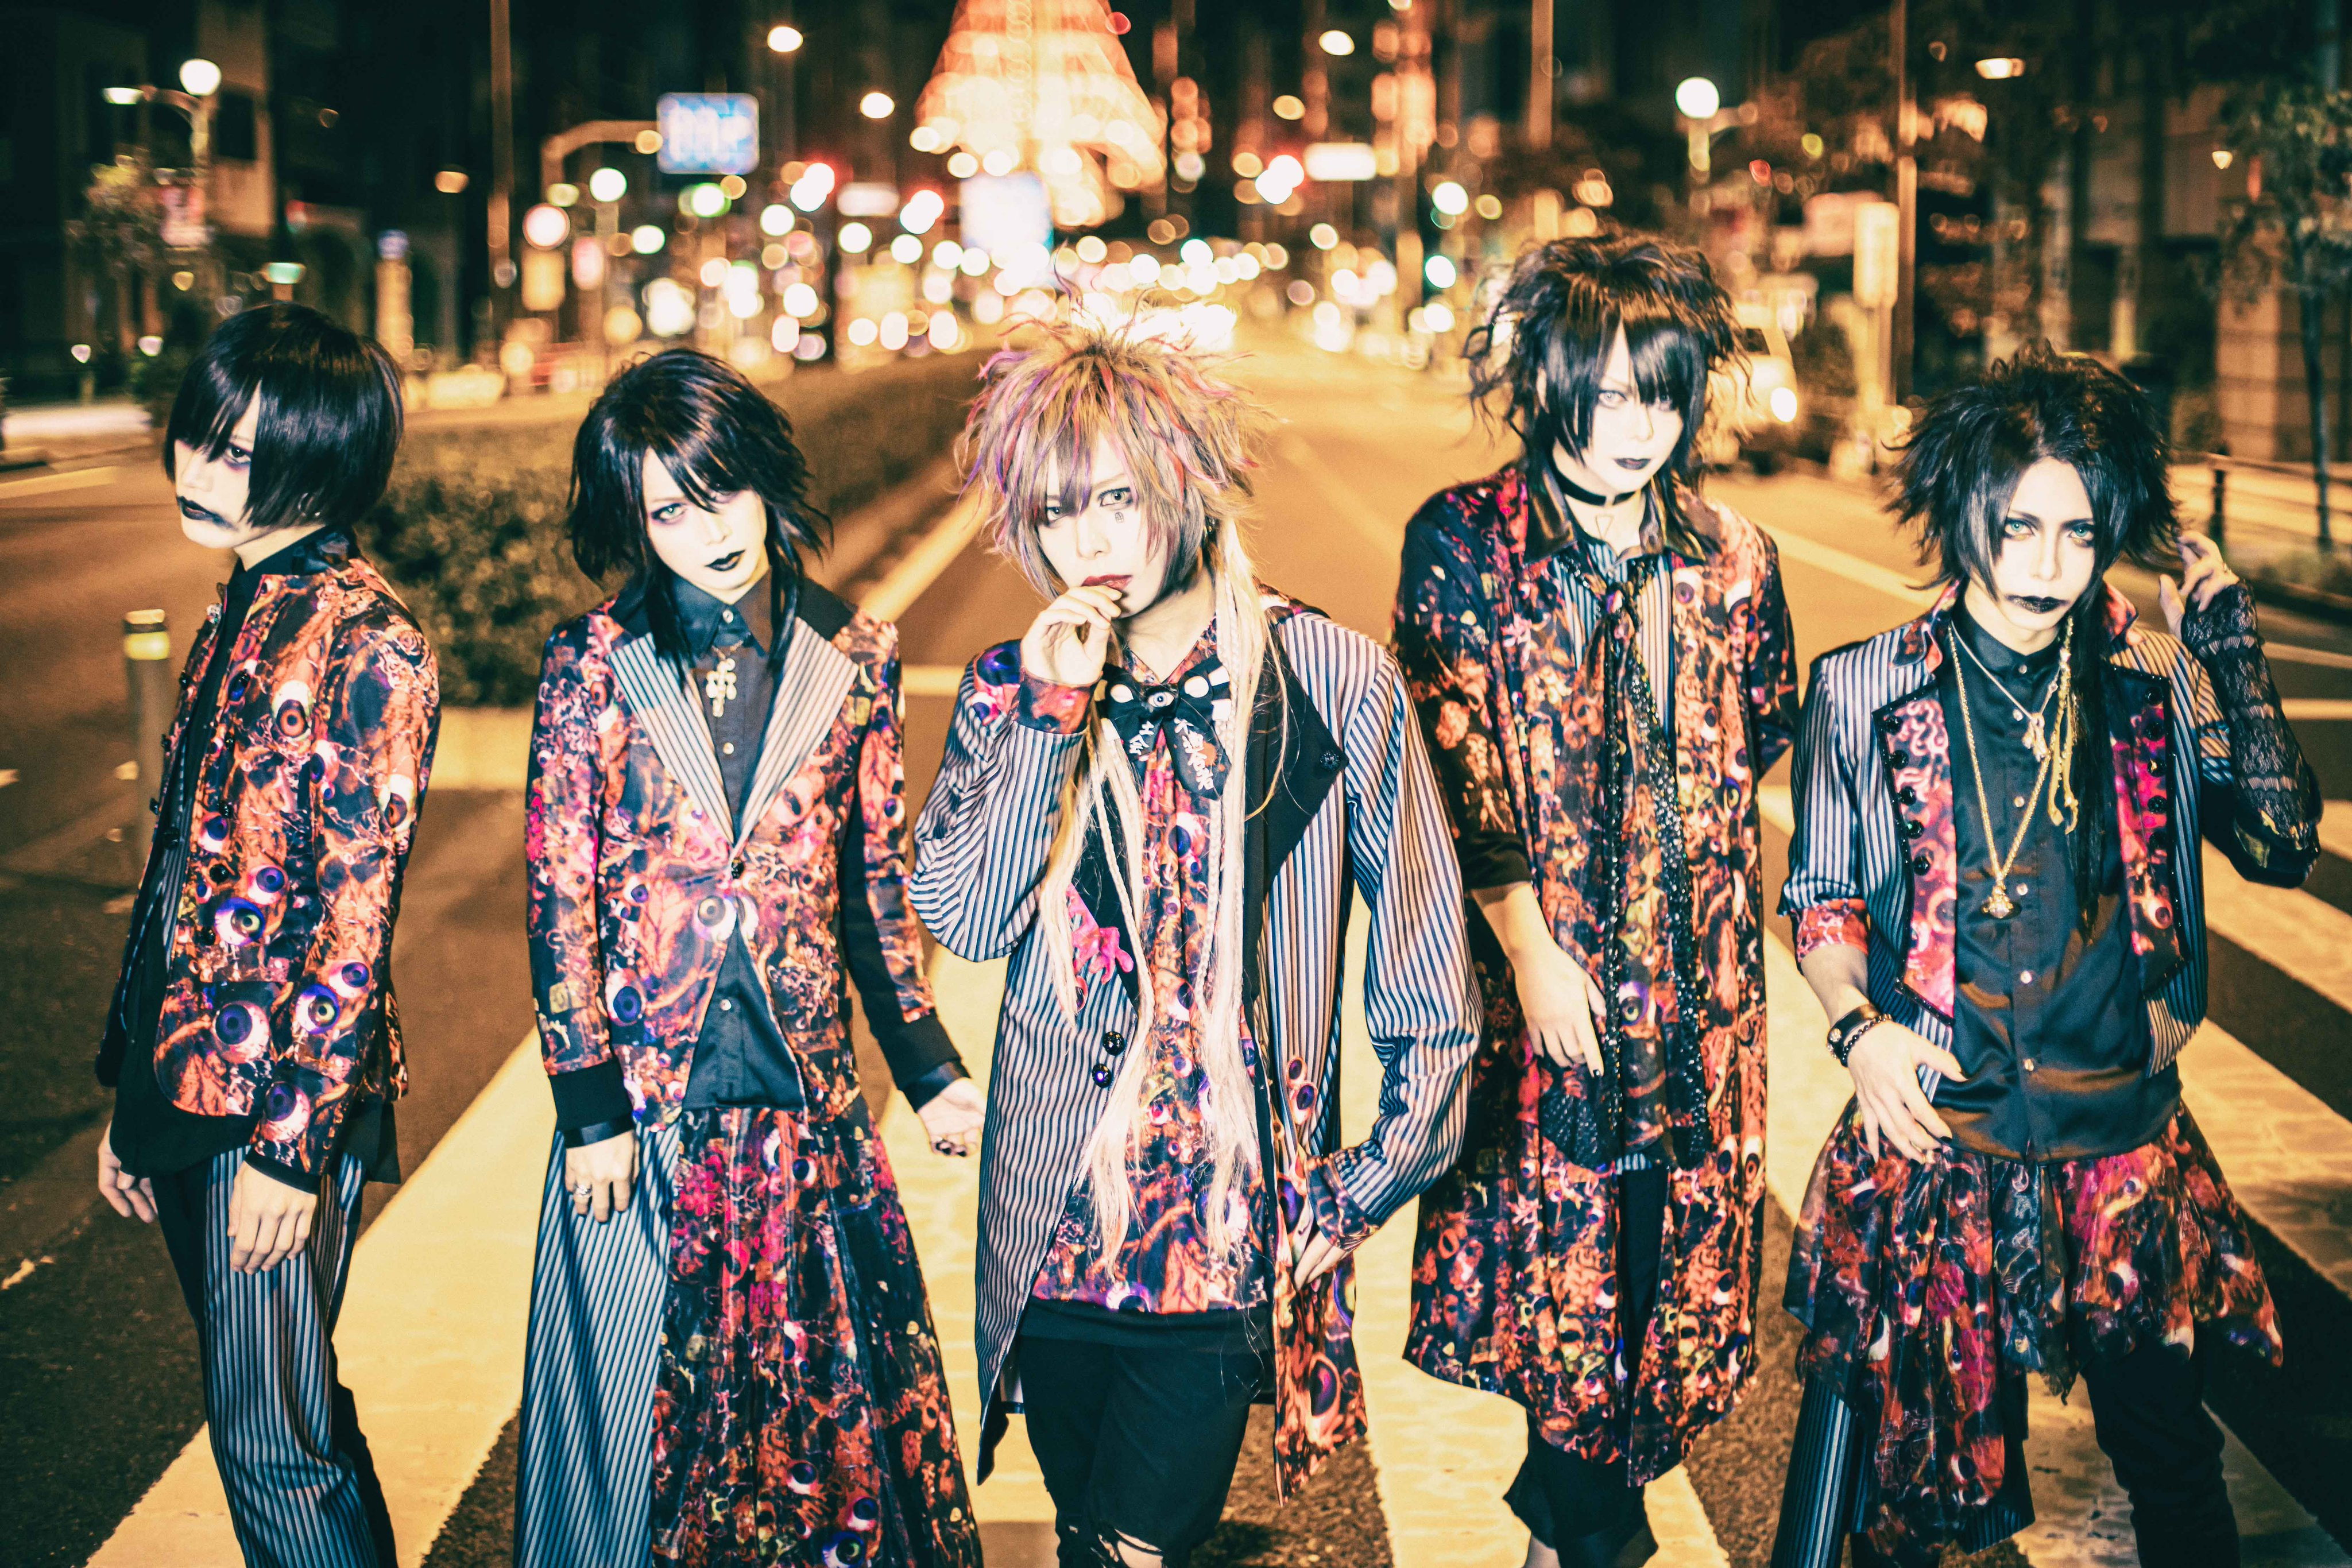 UNDEUX : 安藤の悪魔的レジスタンス / Andou no akumateki resistance (maxi single)